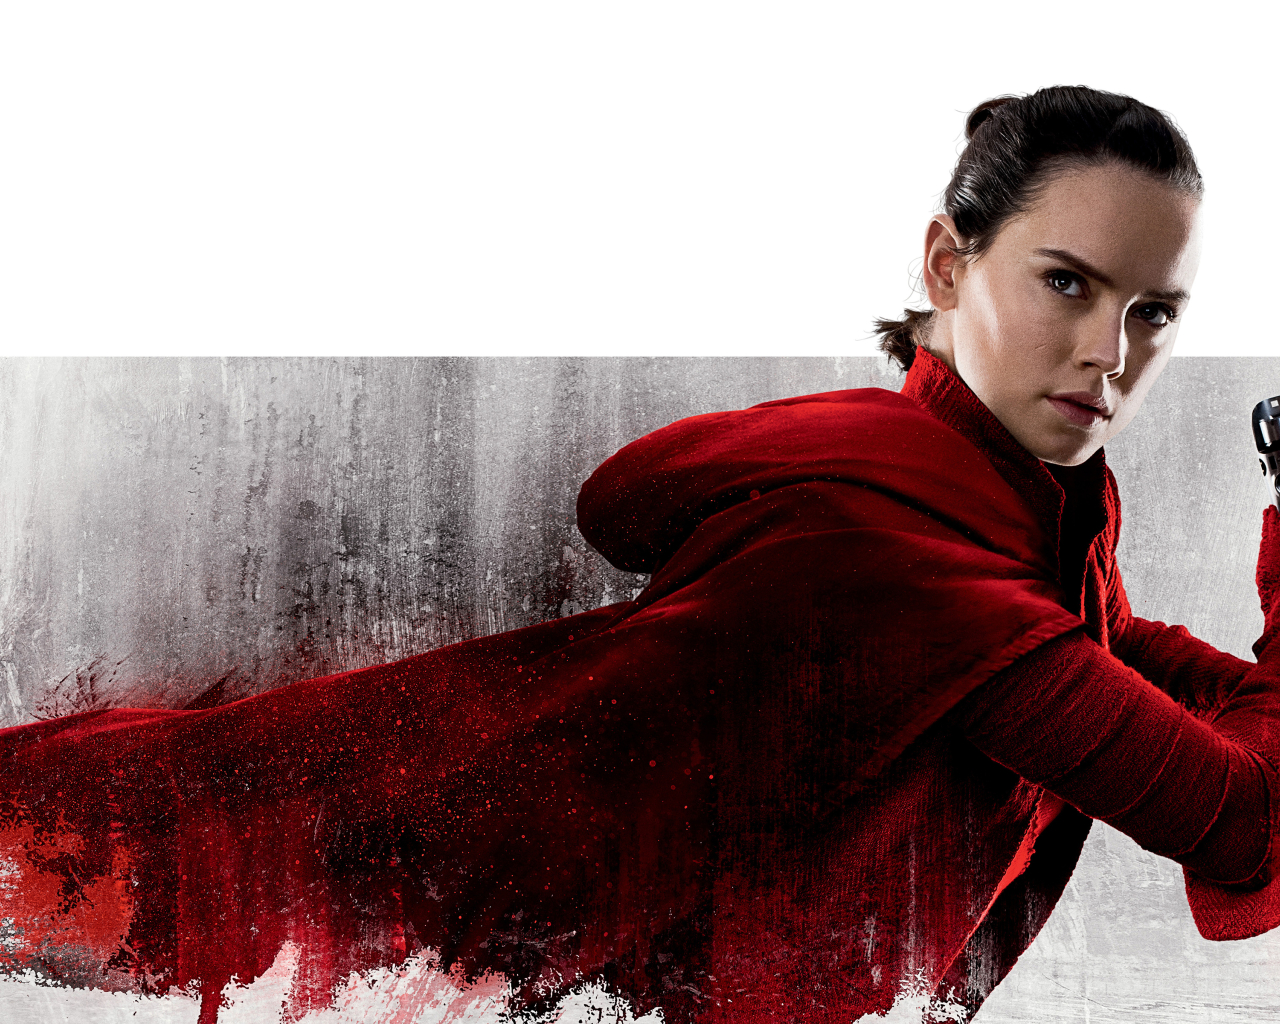 Daisy Ridley Star Wars Episode Viii, HD 4K Wallpaper